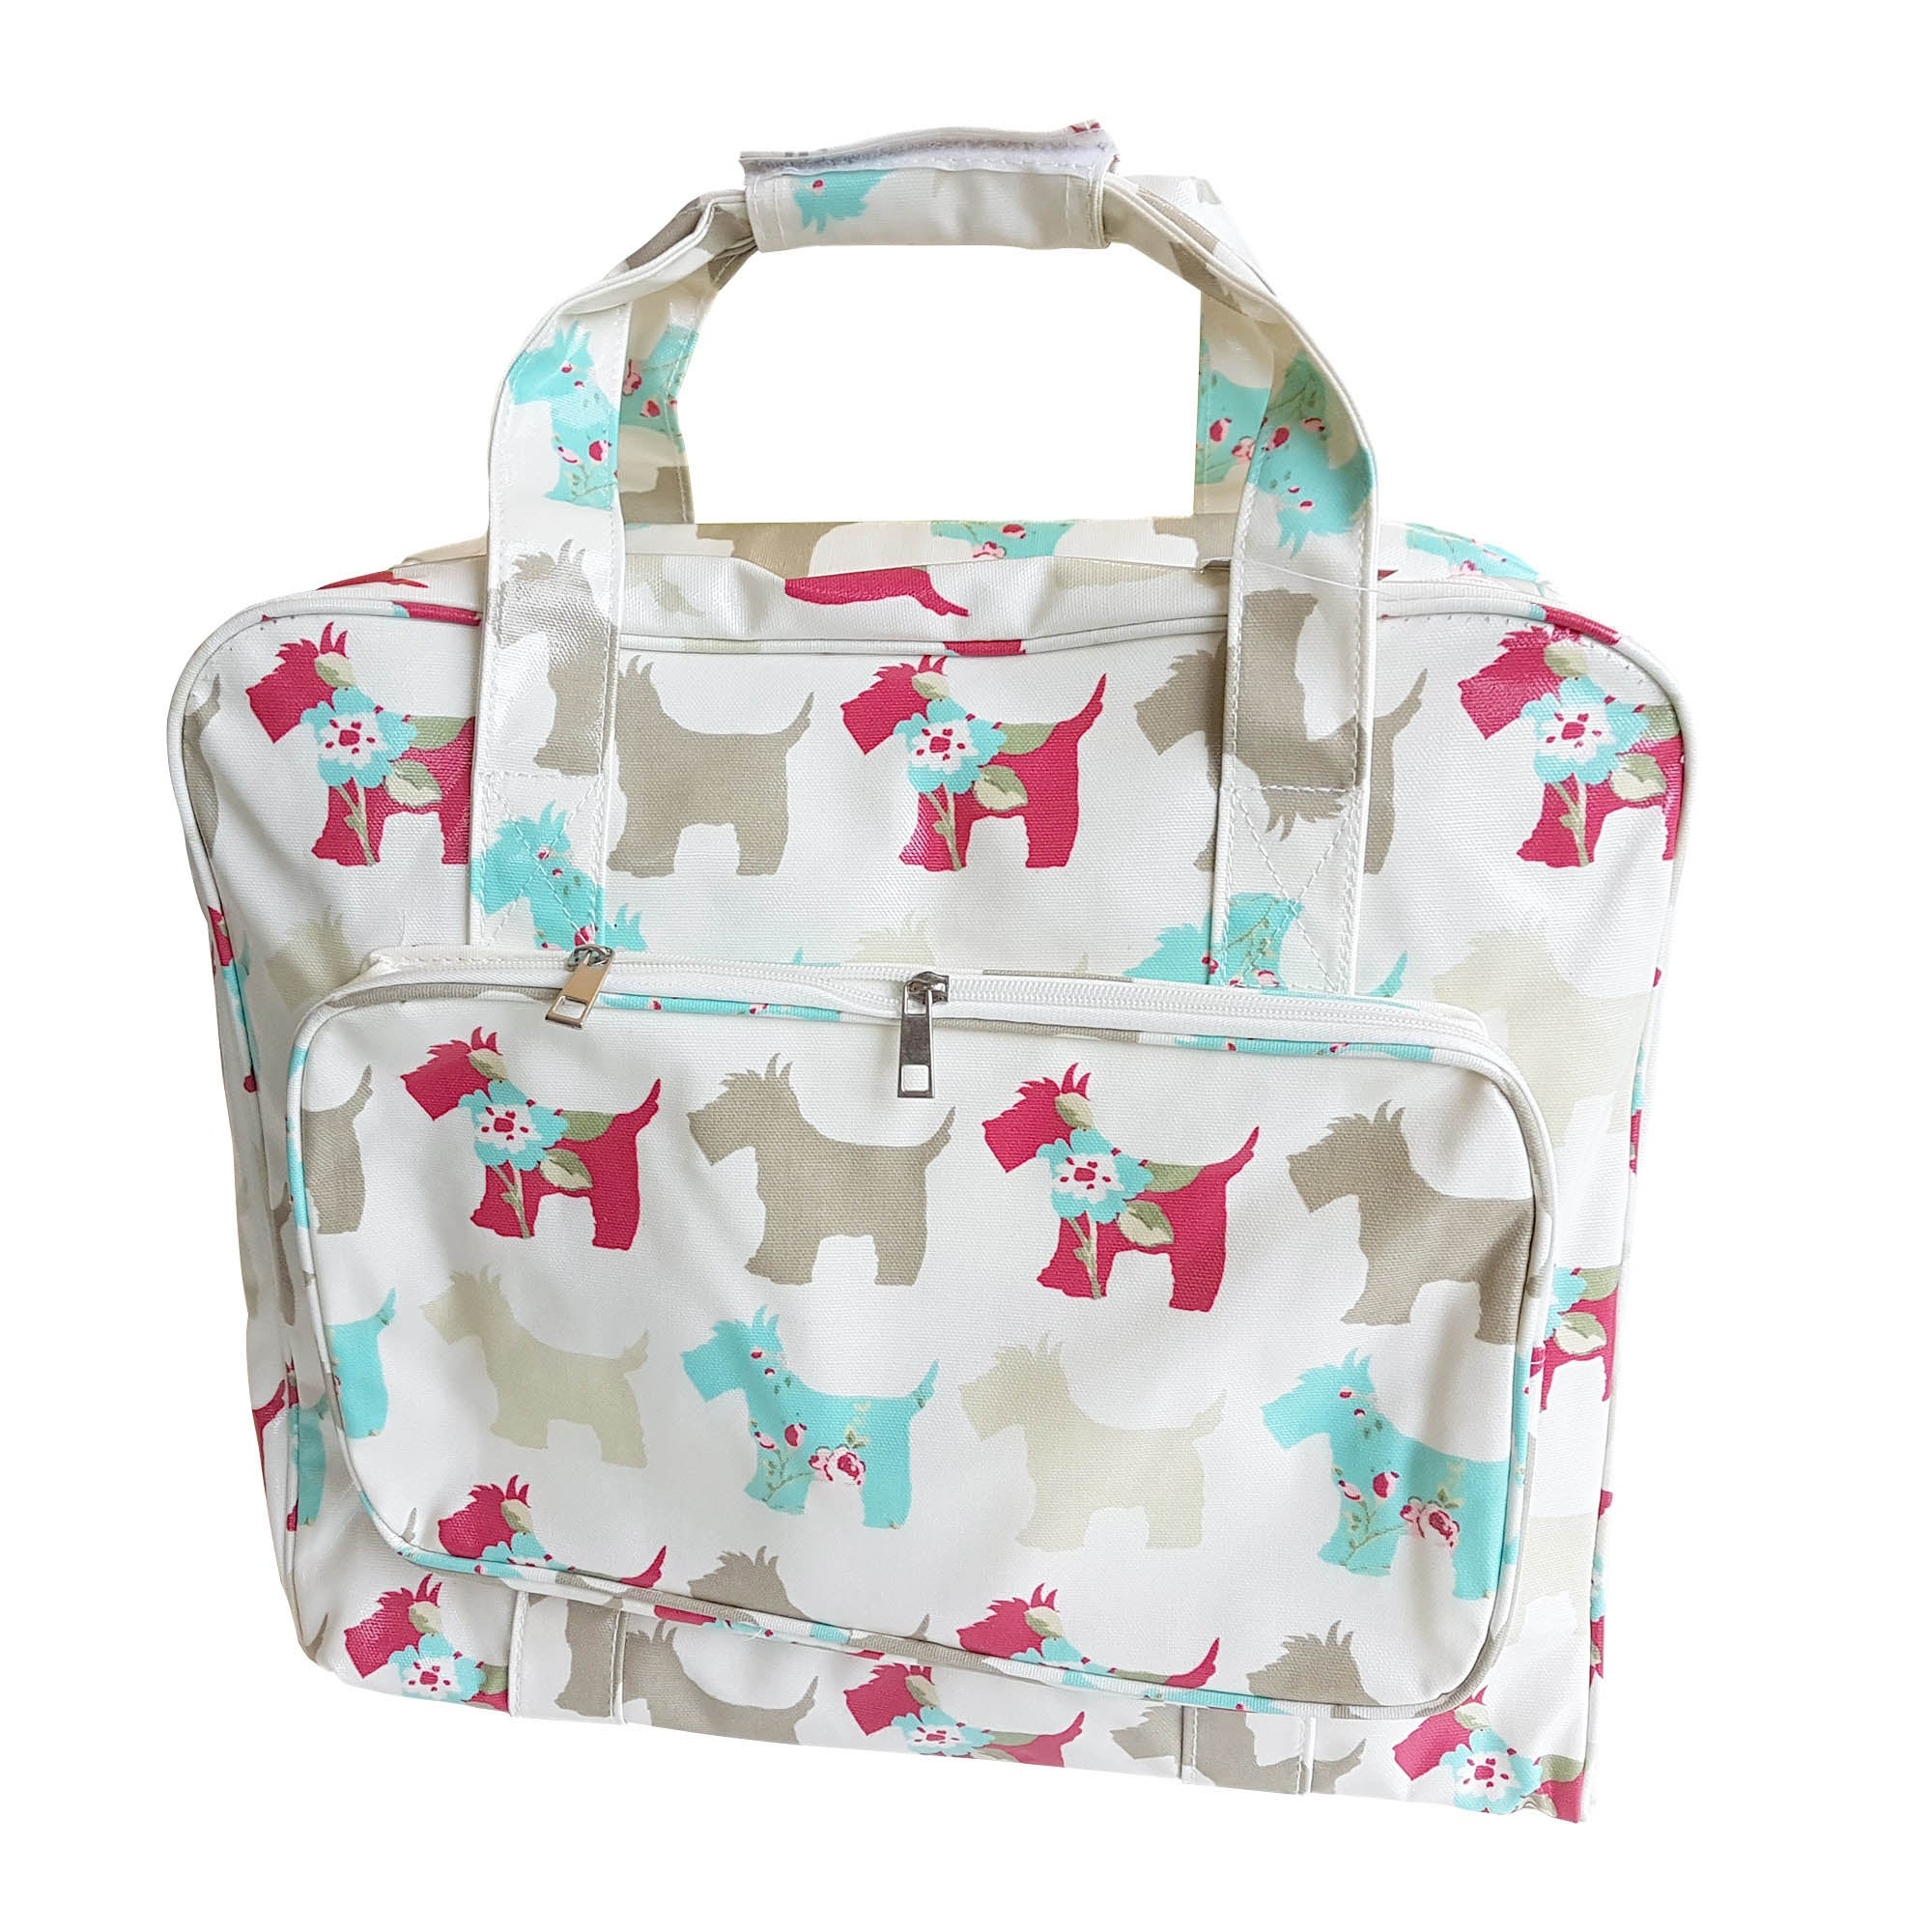 Scotty Dog PVC Sewing Machine Bag White  Pink  Cream